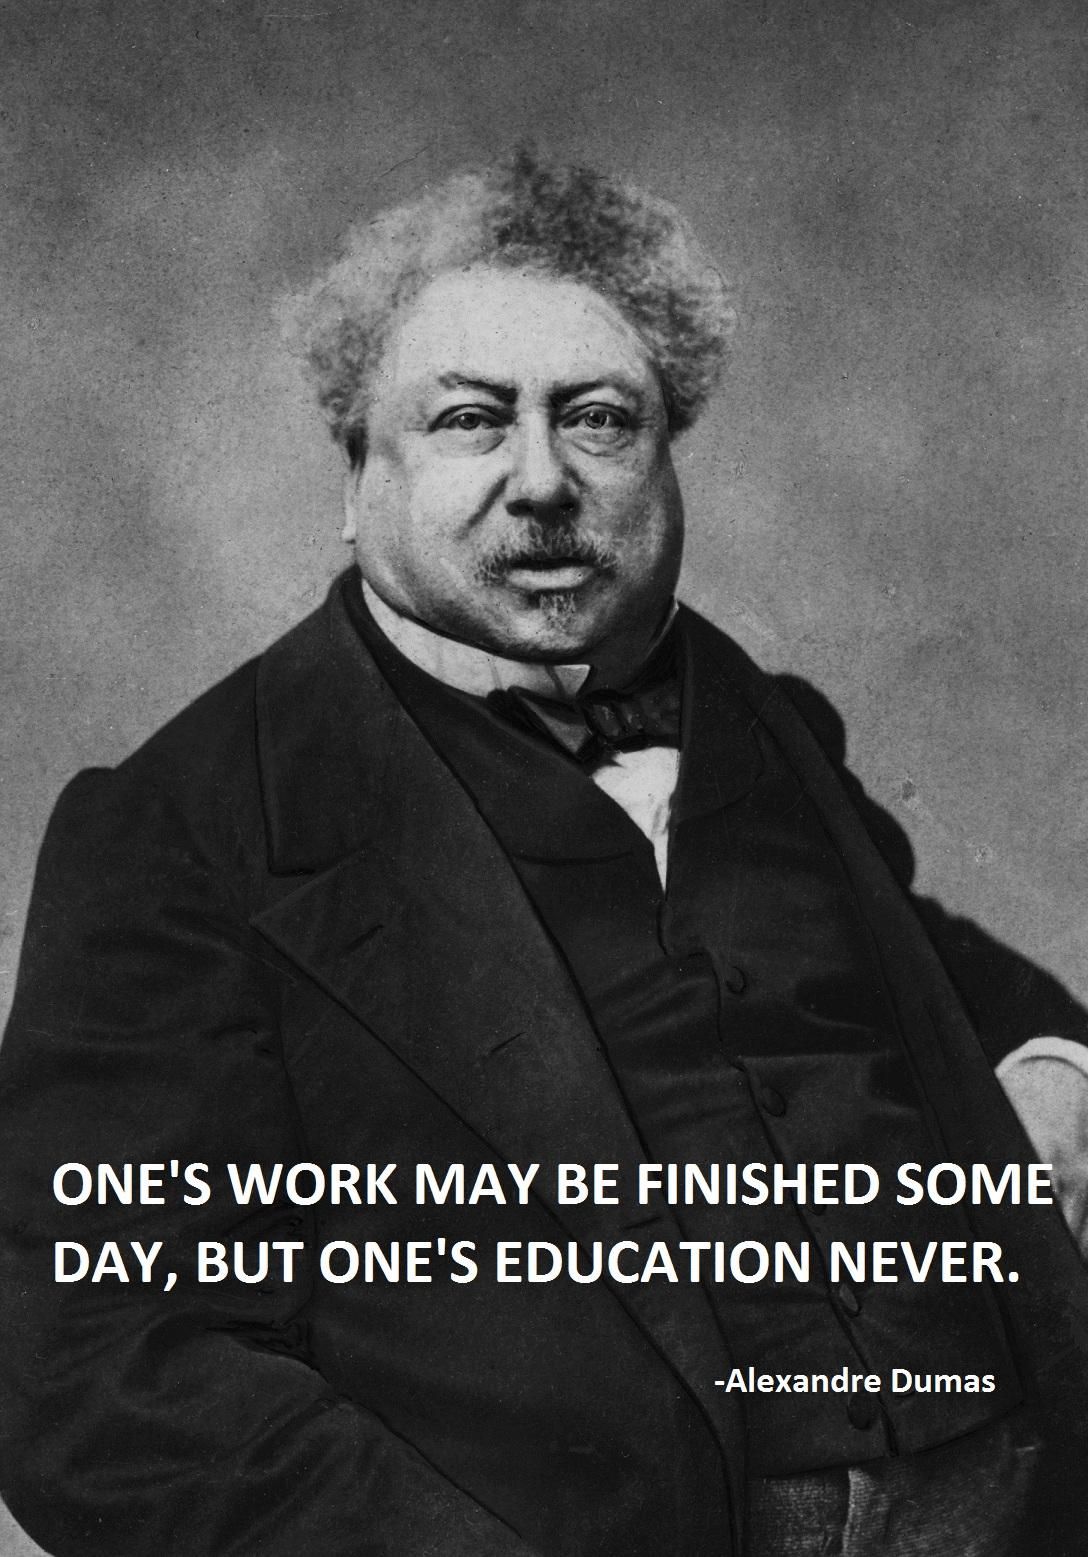 Alexandre Dumas's quote #7